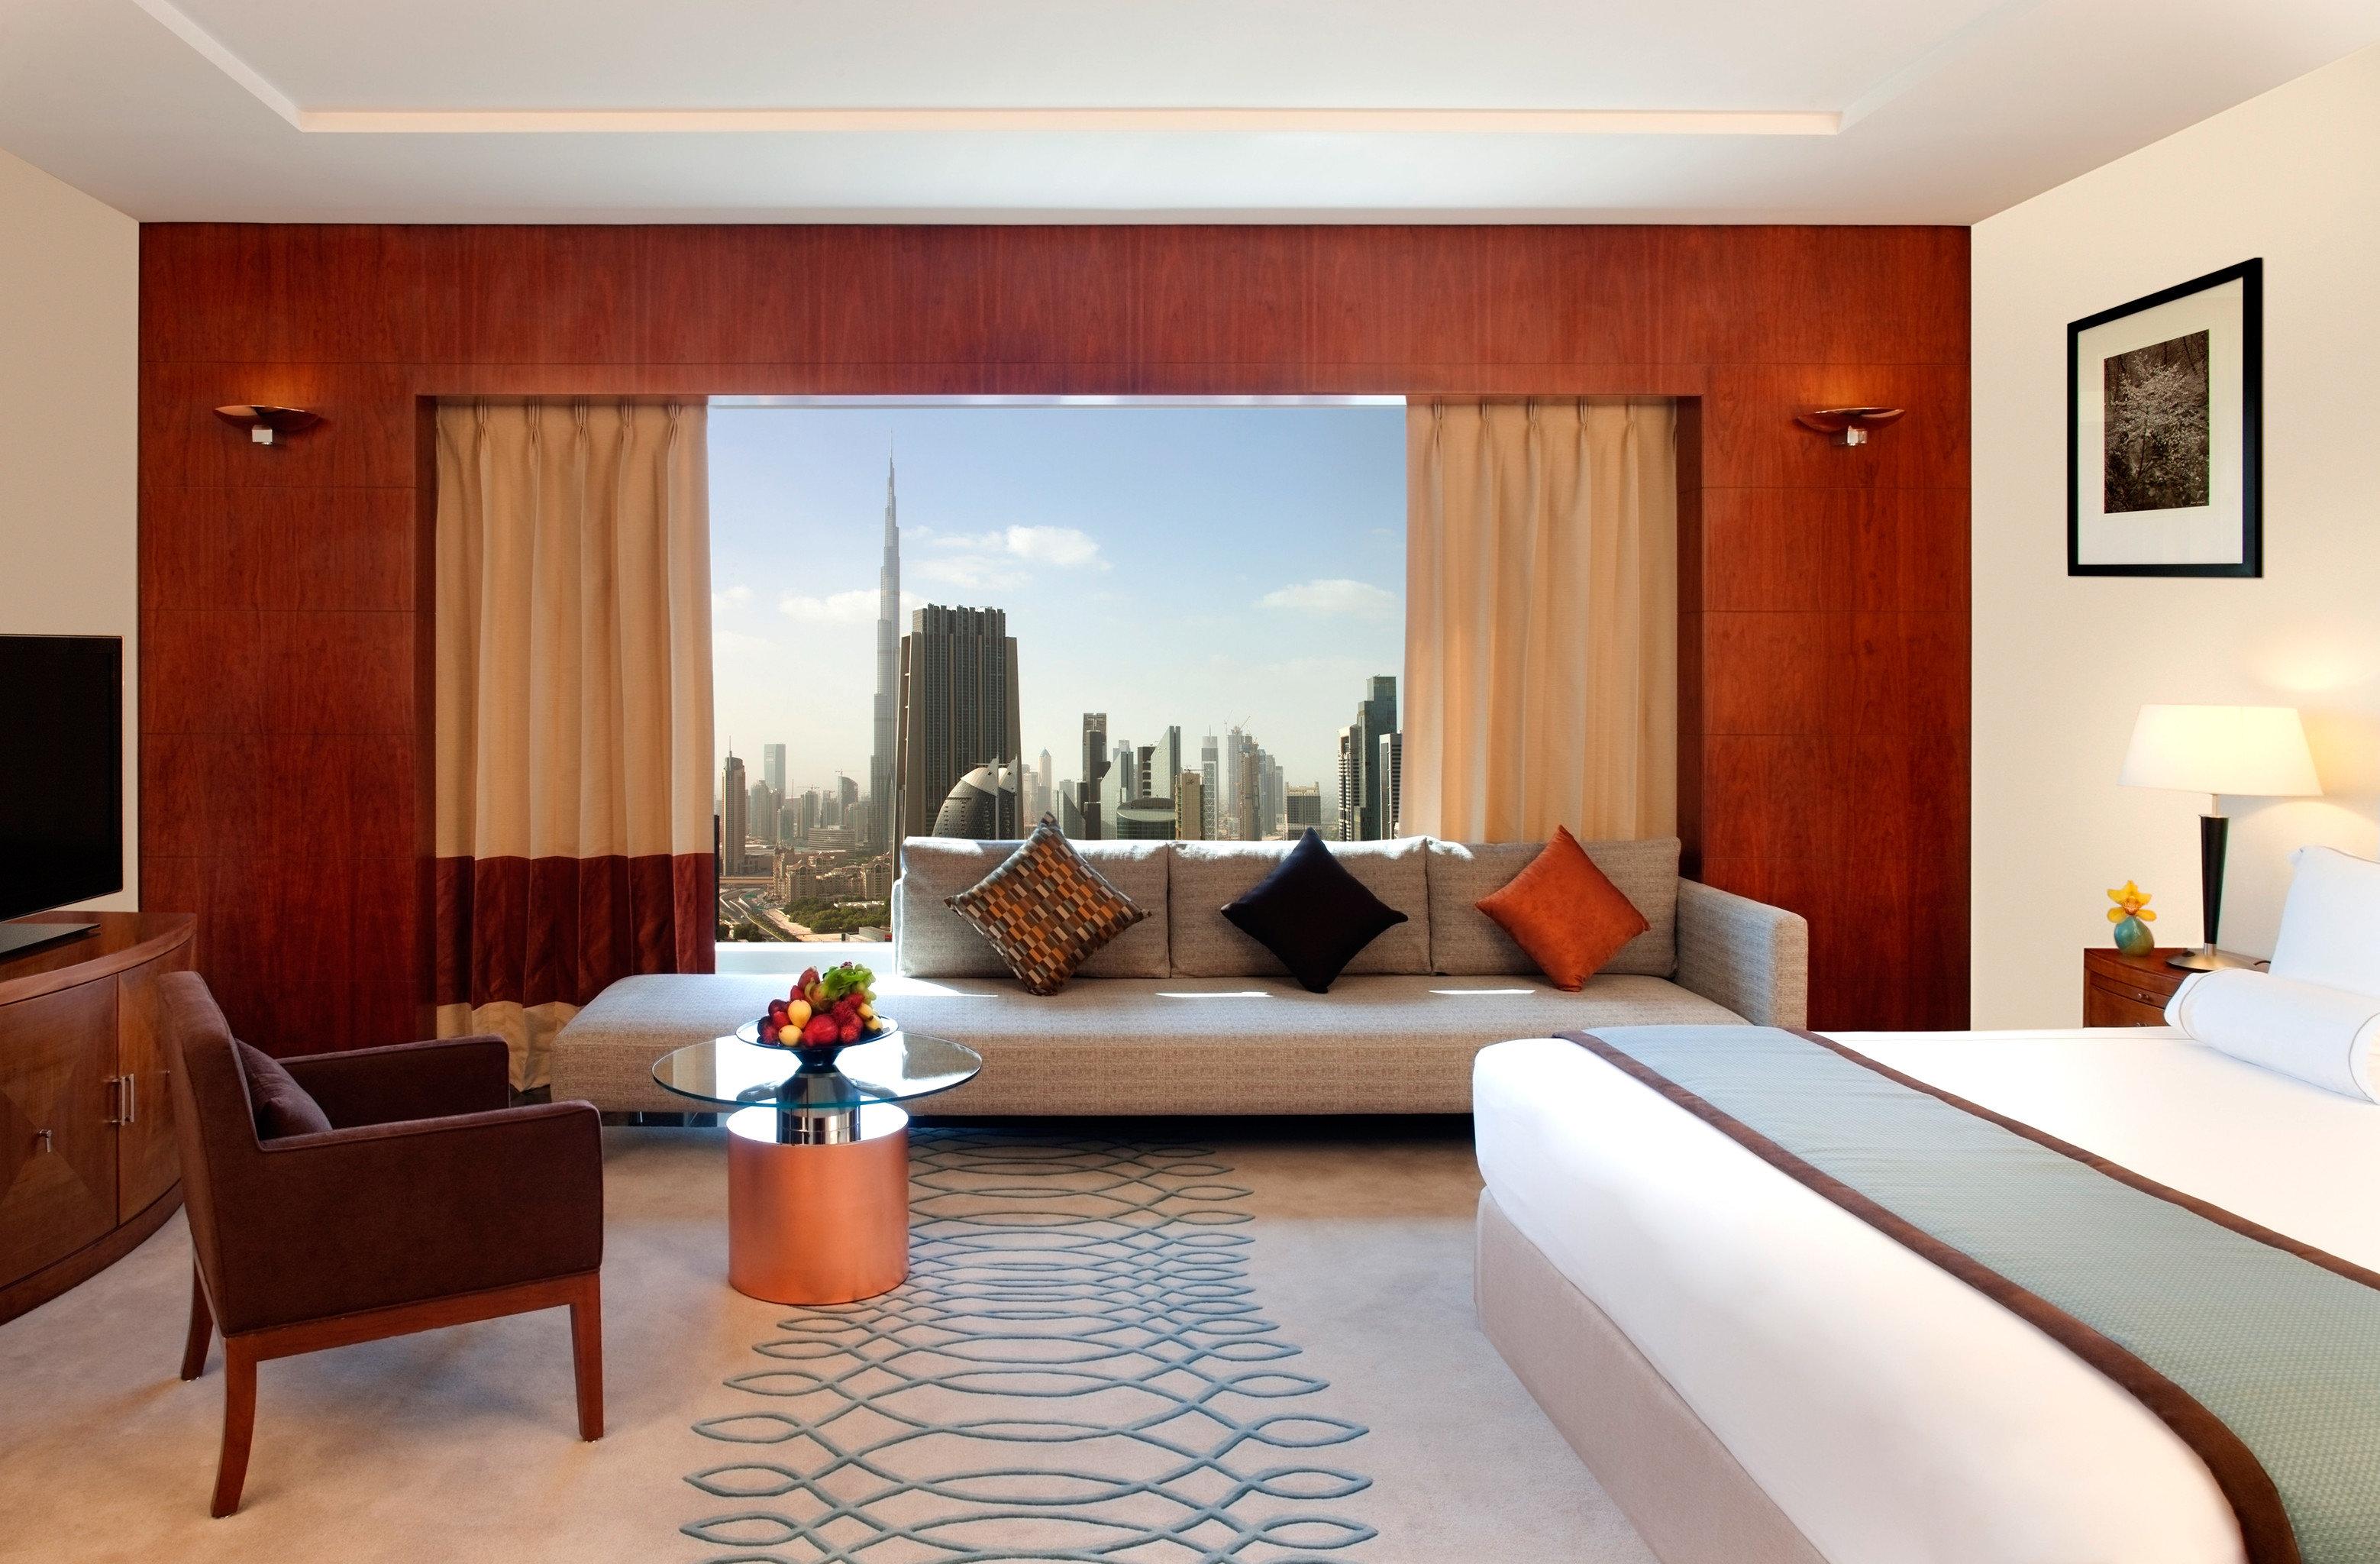 Bedroom City Lounge Scenic views Suite property living room nice condominium Villa cottage flat Resort Modern